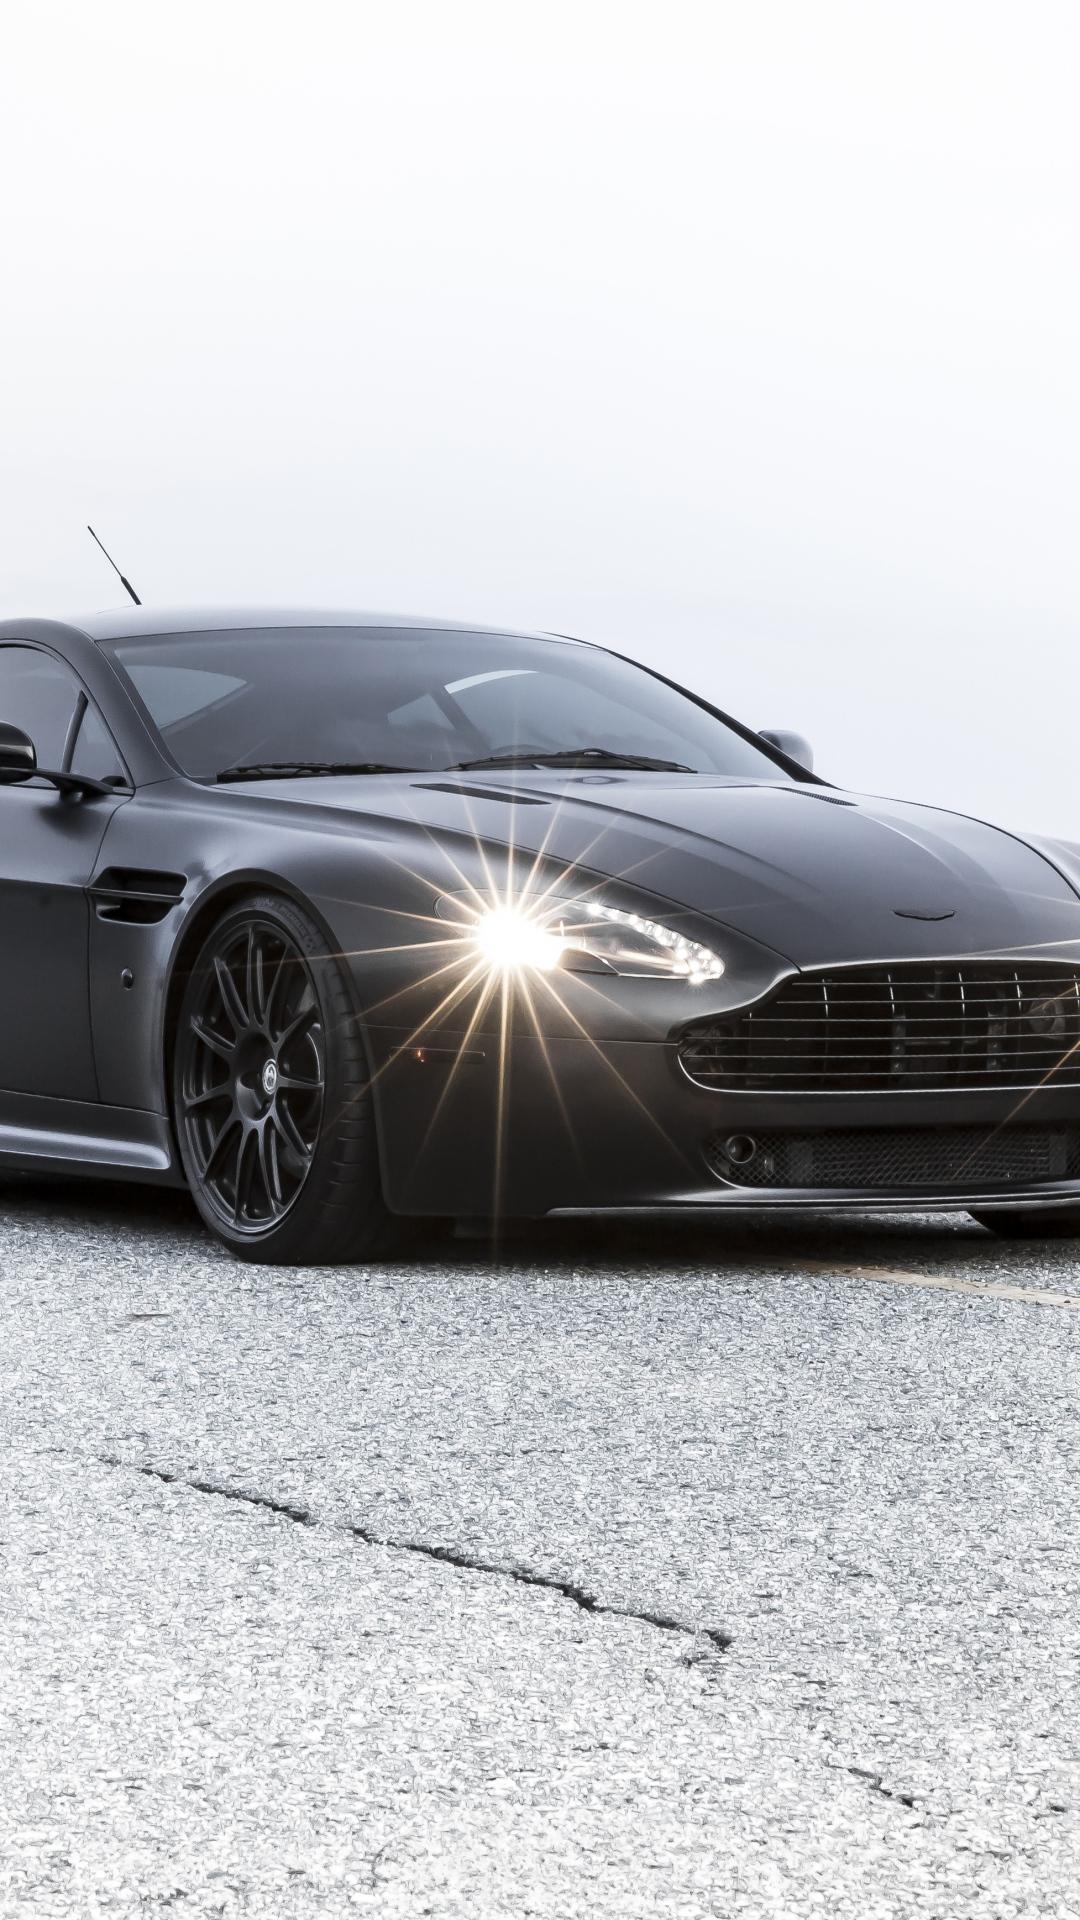 Aston Martin Wallpaper Iphone 1080x1920 Wallpaper Teahub Io